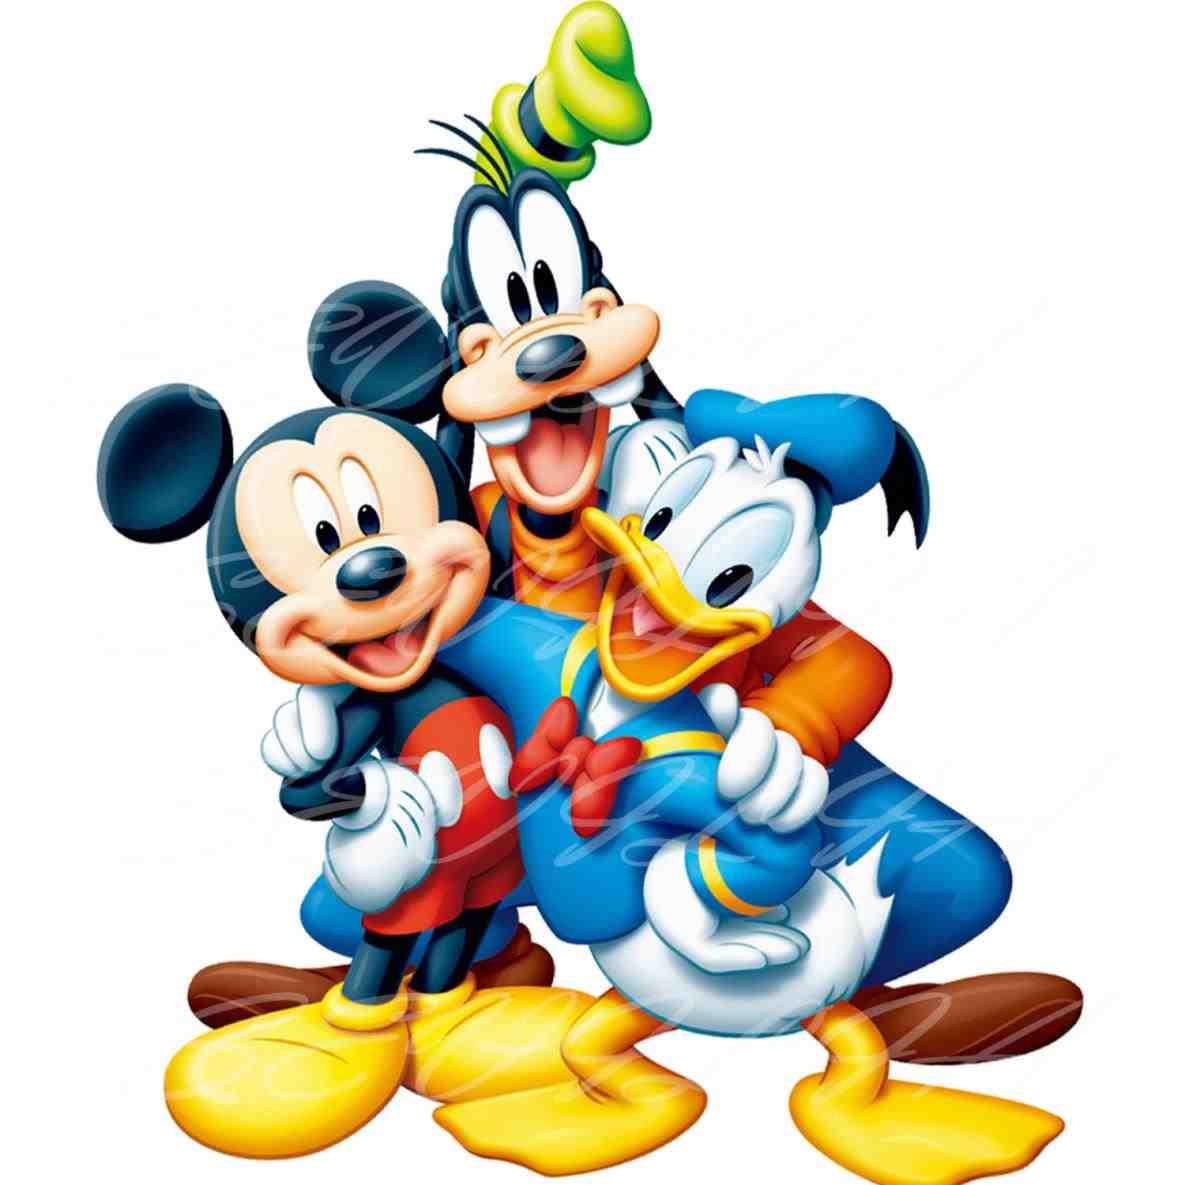 1185x1185 Disney Merry Christmas Clip Art Cheminee.website